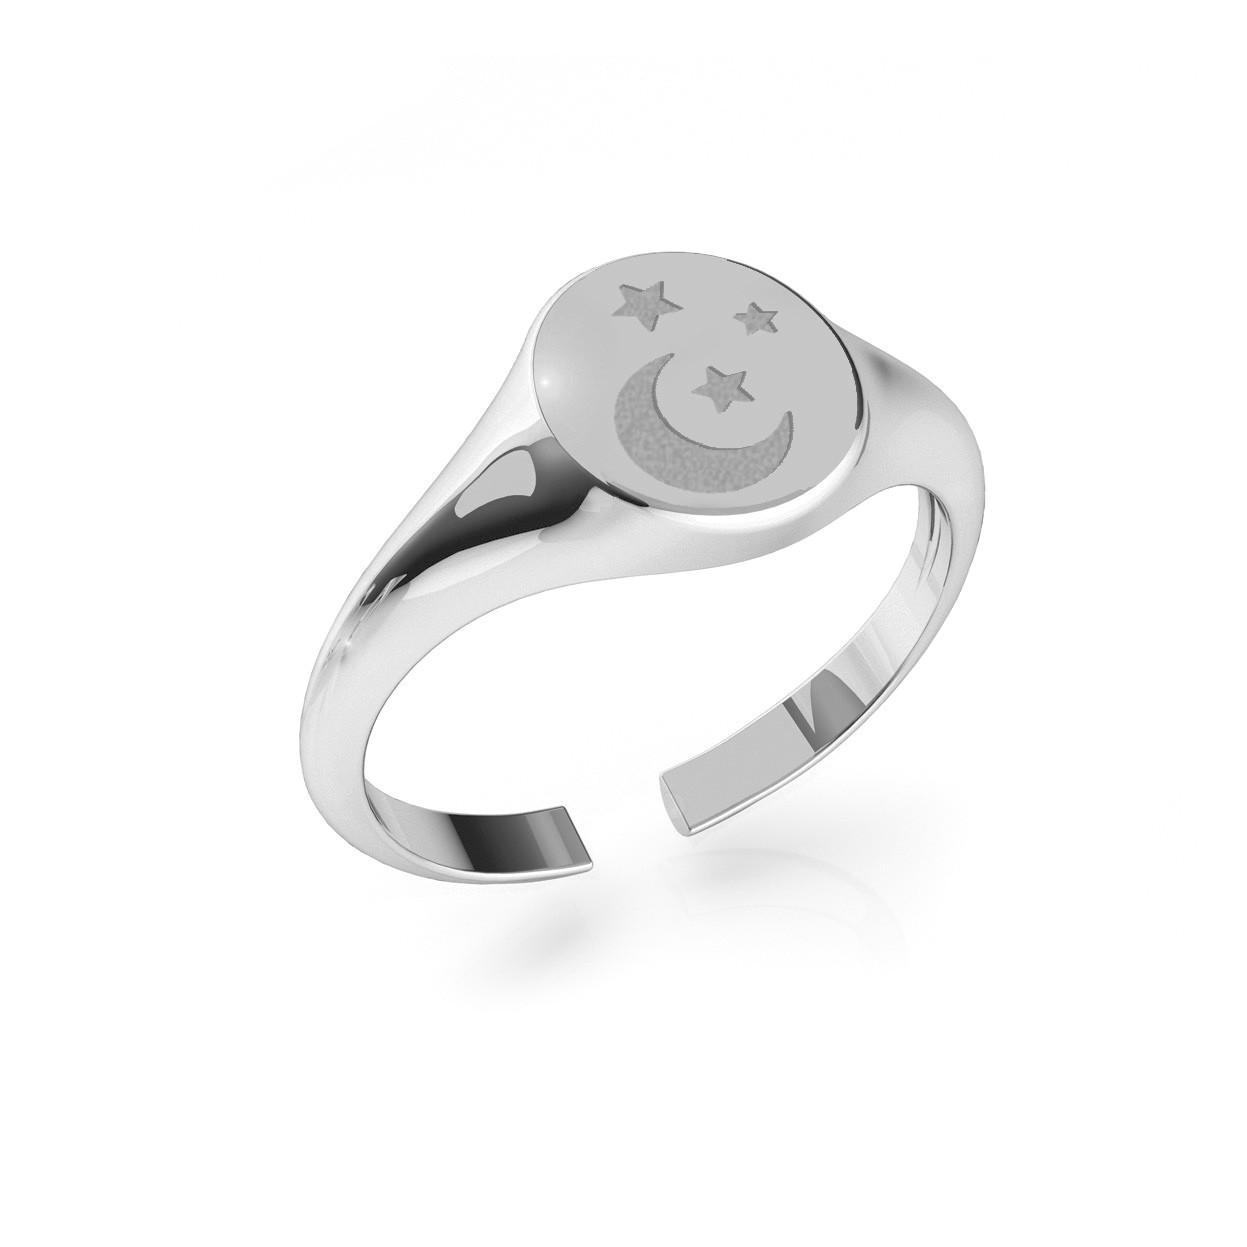 Mond ring, silber 925